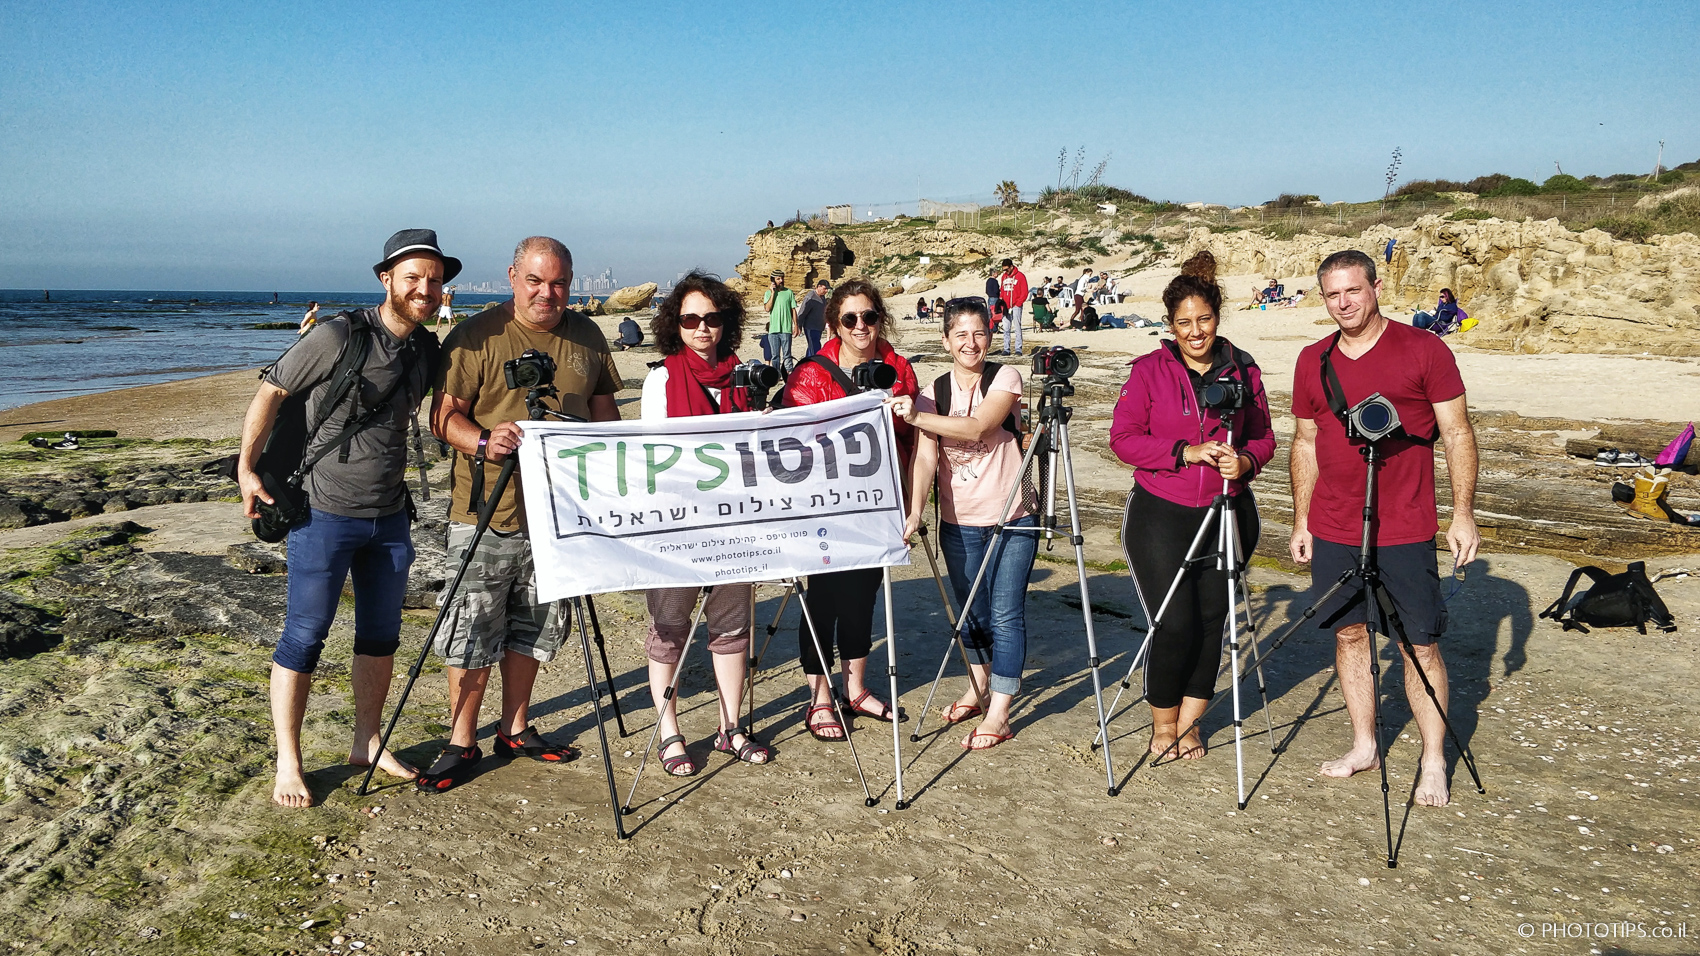 20200228 - PhotoTips Workshops w Flag -